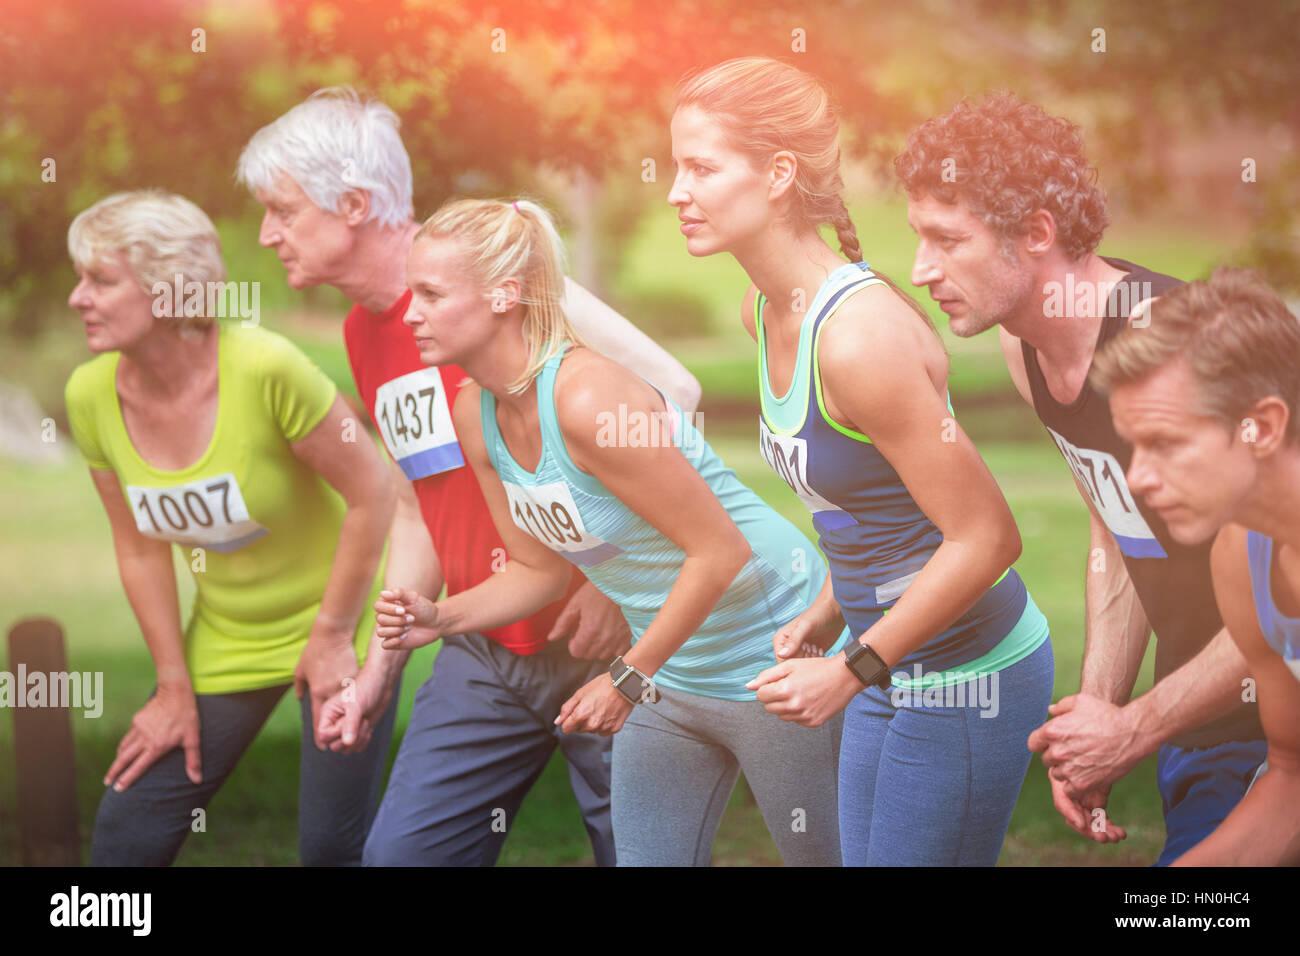 Marathon athletes on the starting line in park - Stock Image